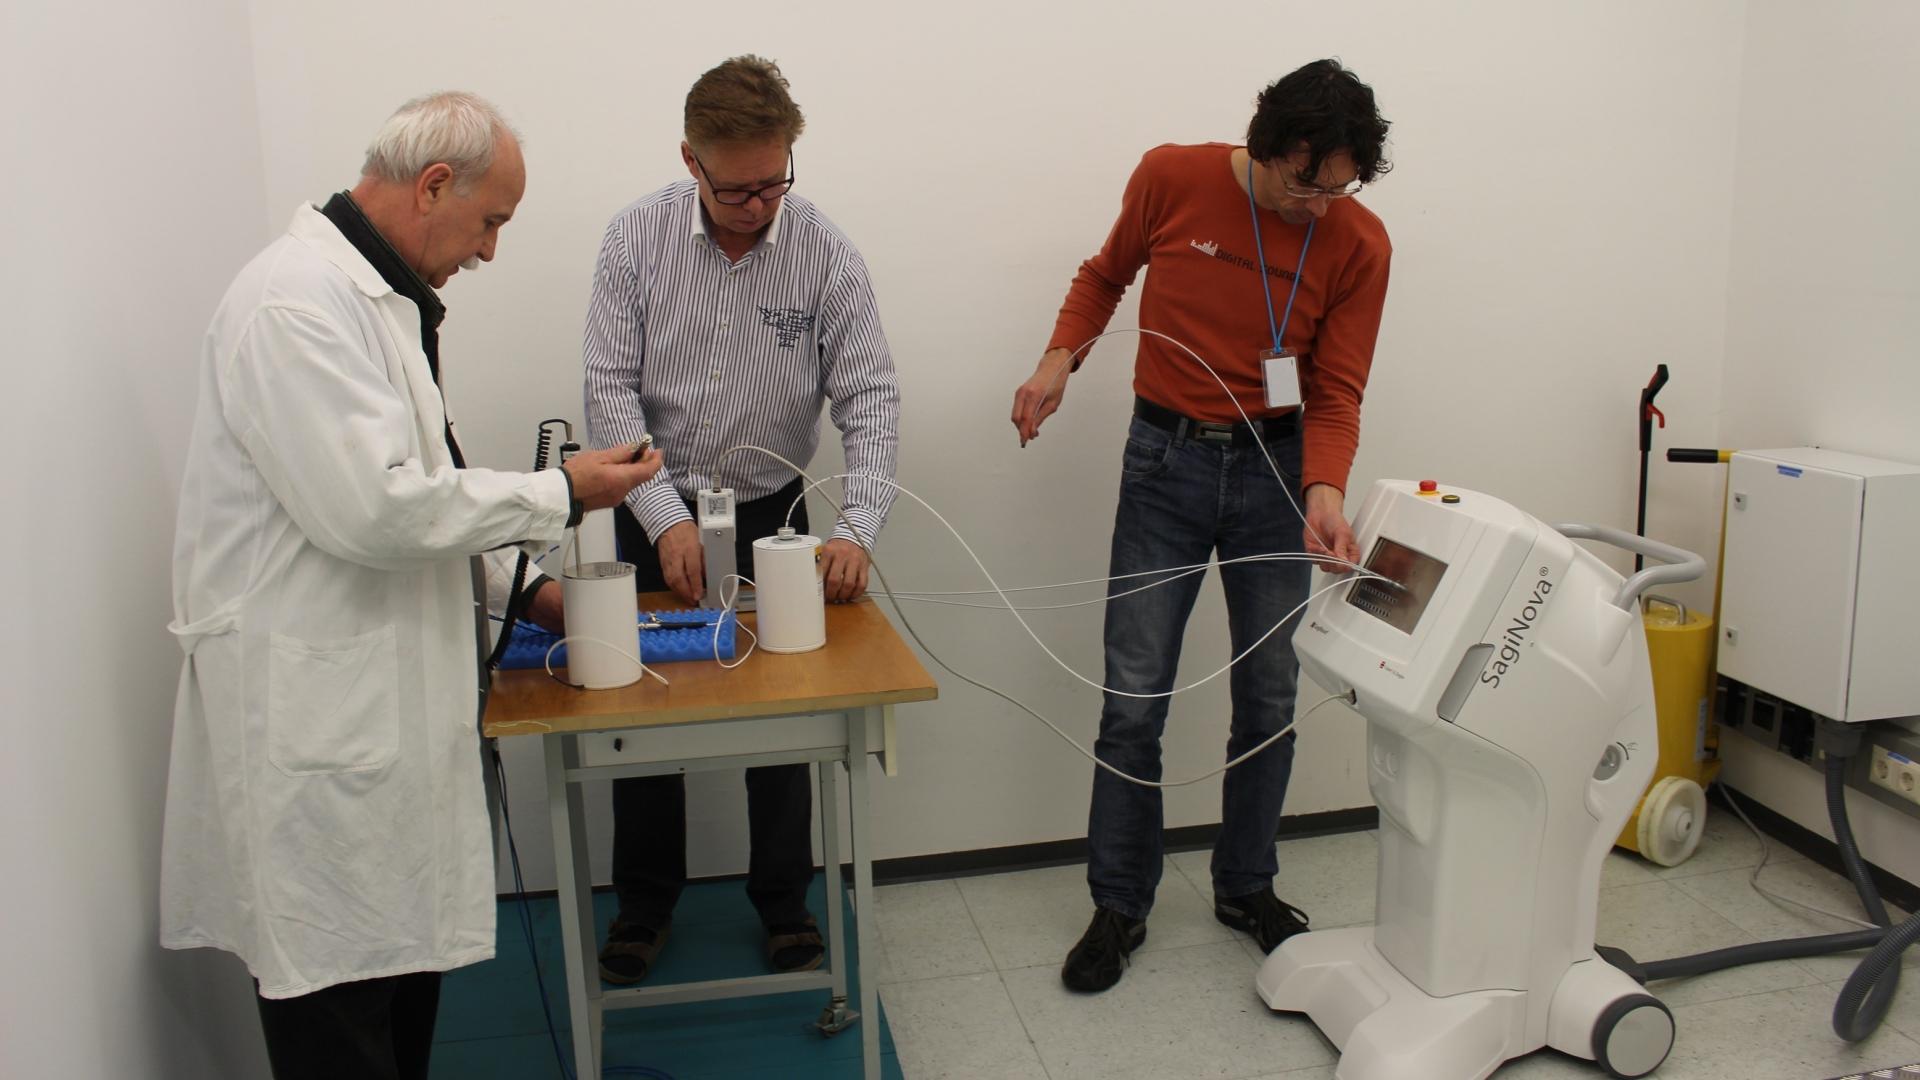 Iaea Laboratories Expand Radiation Medicine Services To